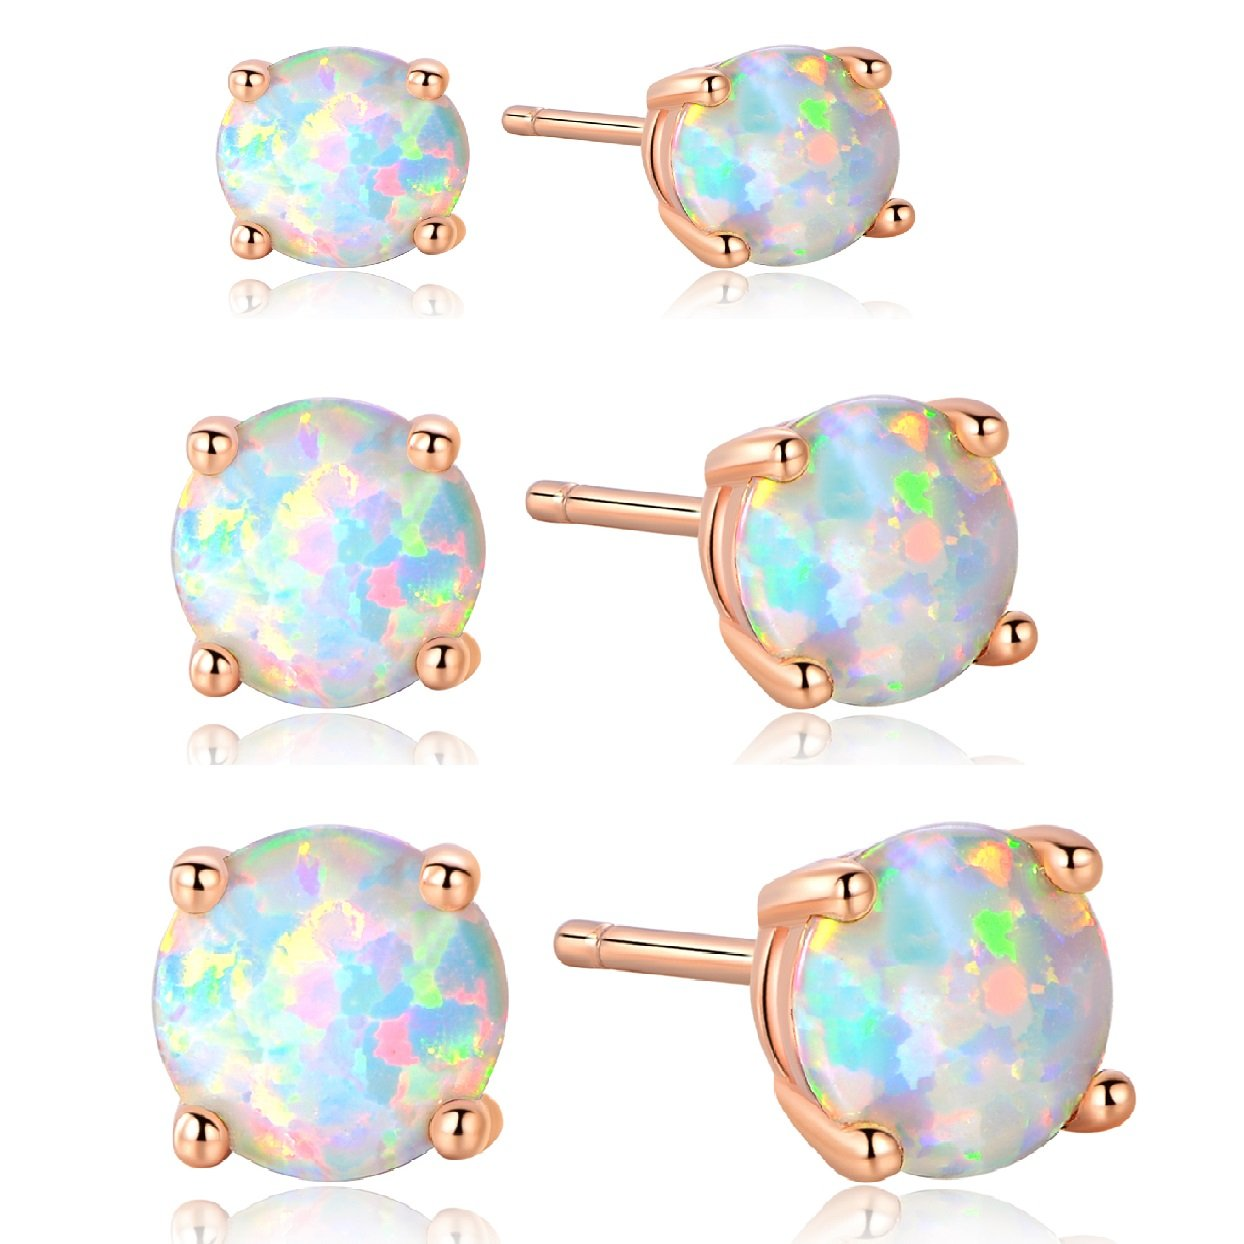 GEMSME 18K Rose Gold Plated 3/5/7mm Round Opal Stud Earrings Pack of 3